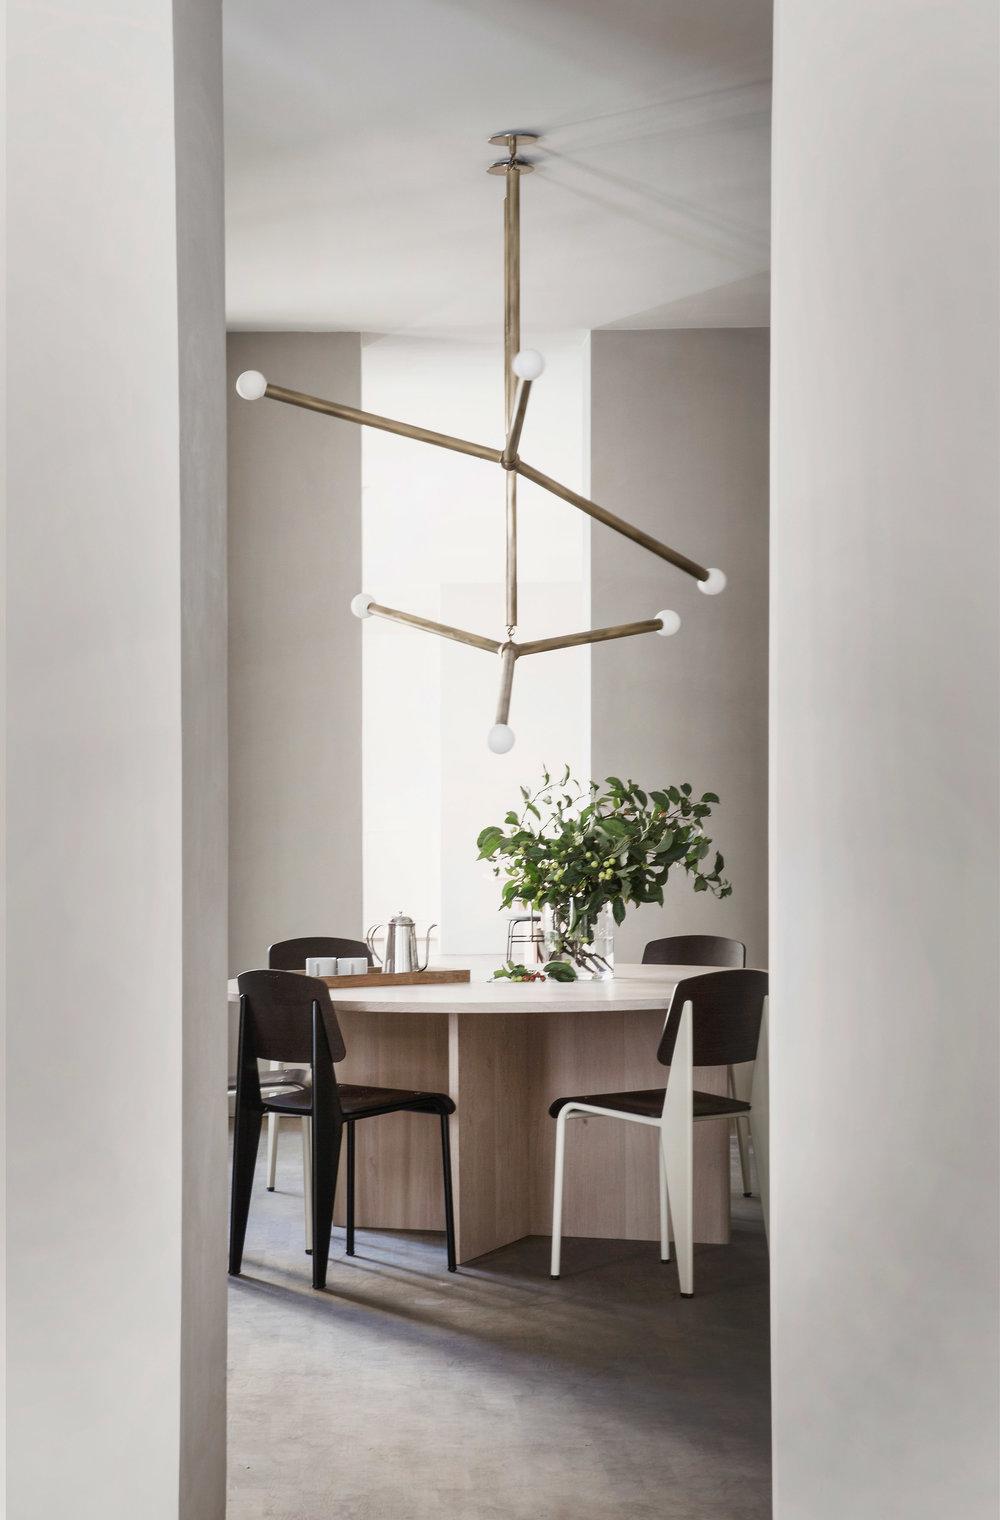 kinfolk-office_norm_architects_interiors_gallery_copenhagen_dezeen_2364_col_8.jpg